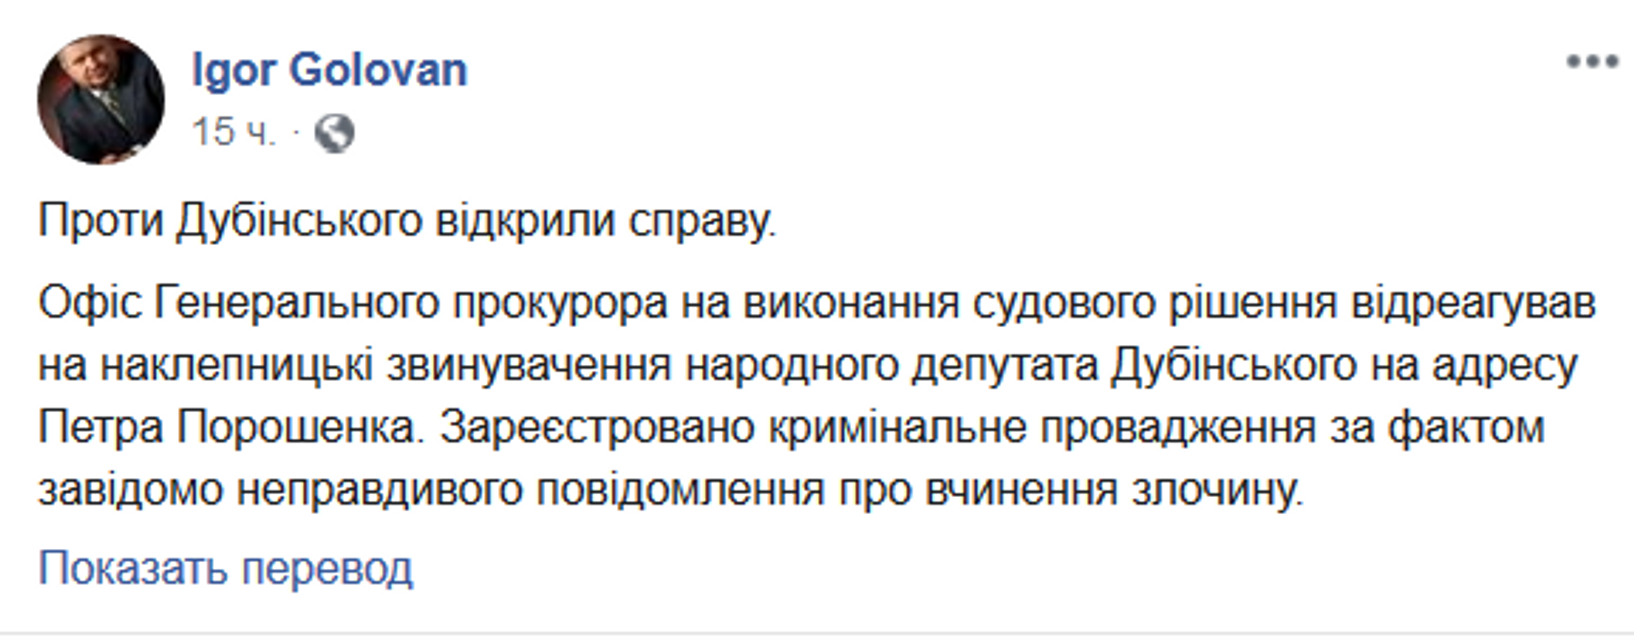 Прокуратура взялась за Дубинского: Из-за Порошенко – ФОТО - фото 196915